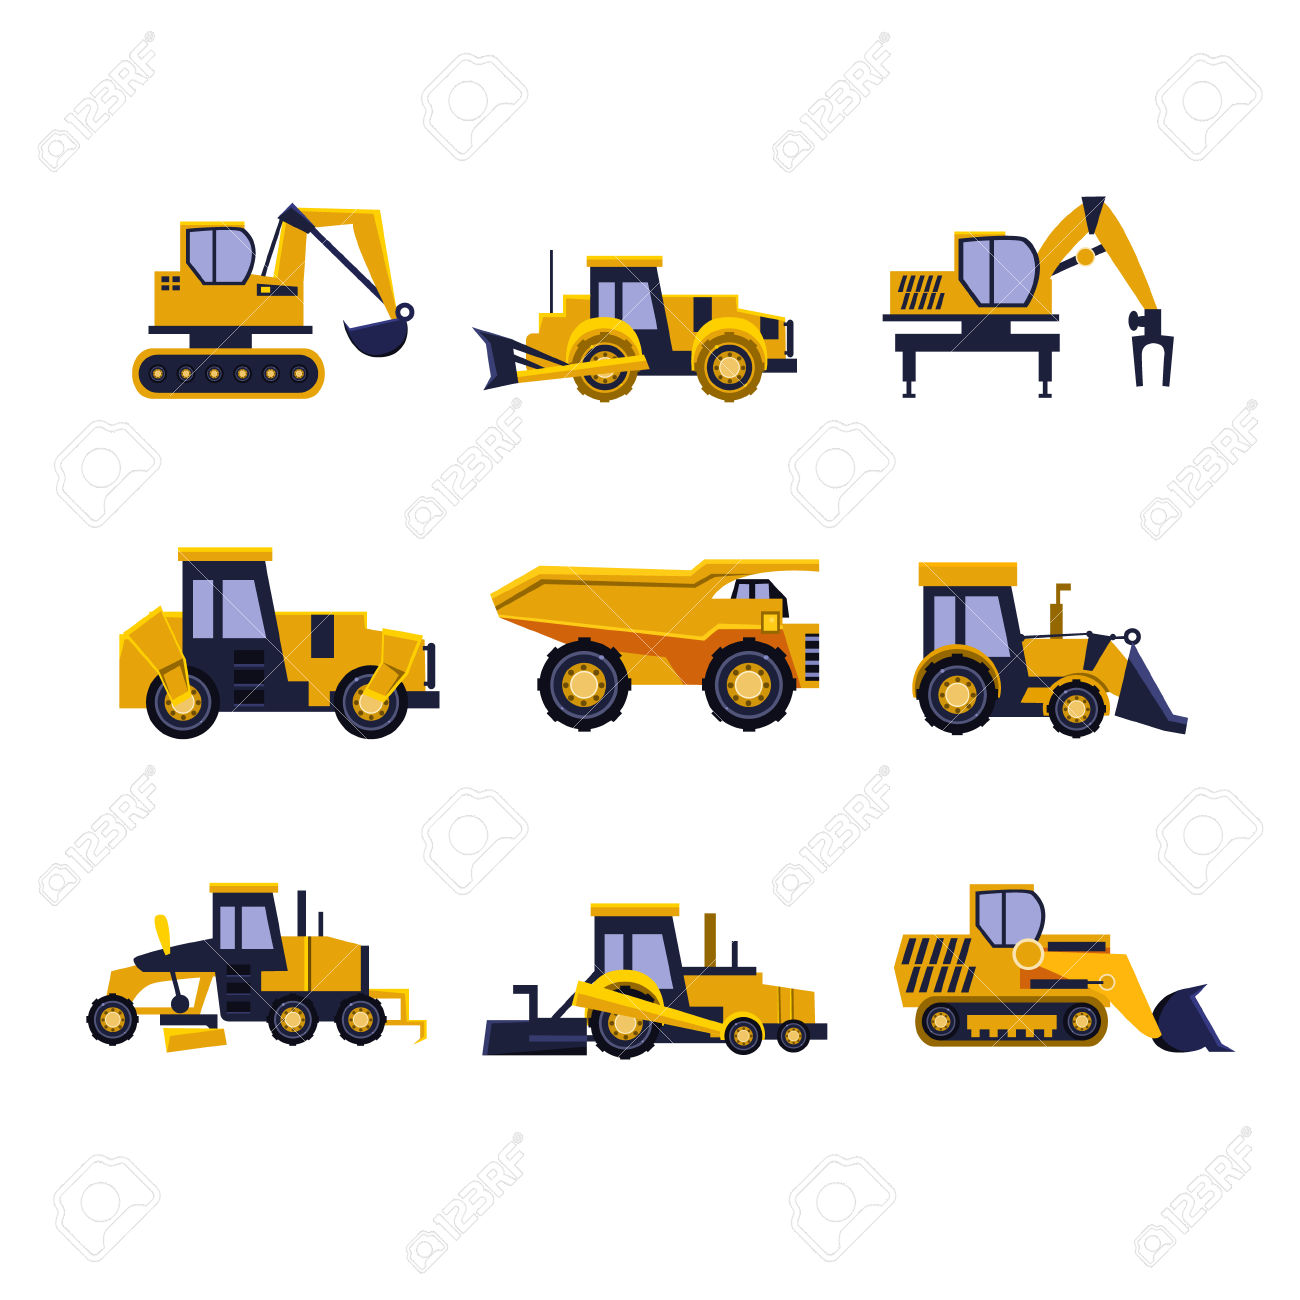 Construction Equipment Road Roller, Excavator, Bulldozer And.